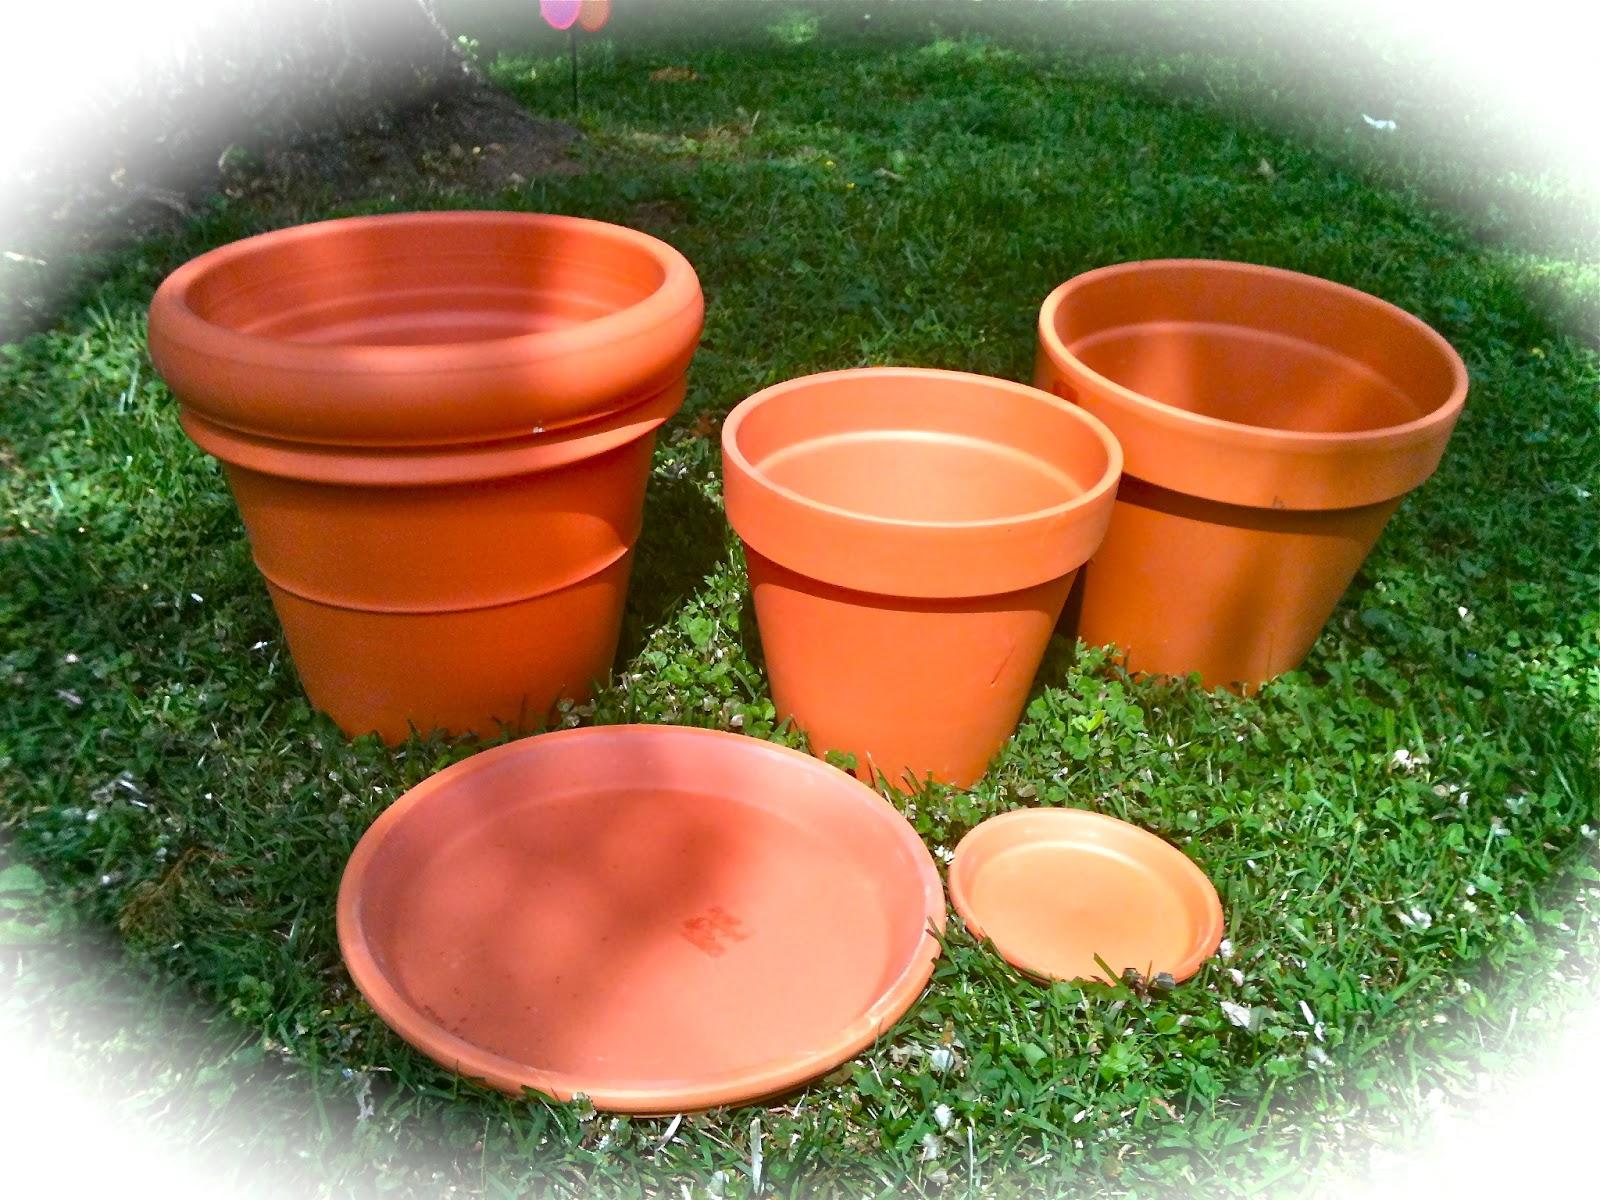 everyday donna how to make a birdbath from terra cotta pots. Black Bedroom Furniture Sets. Home Design Ideas